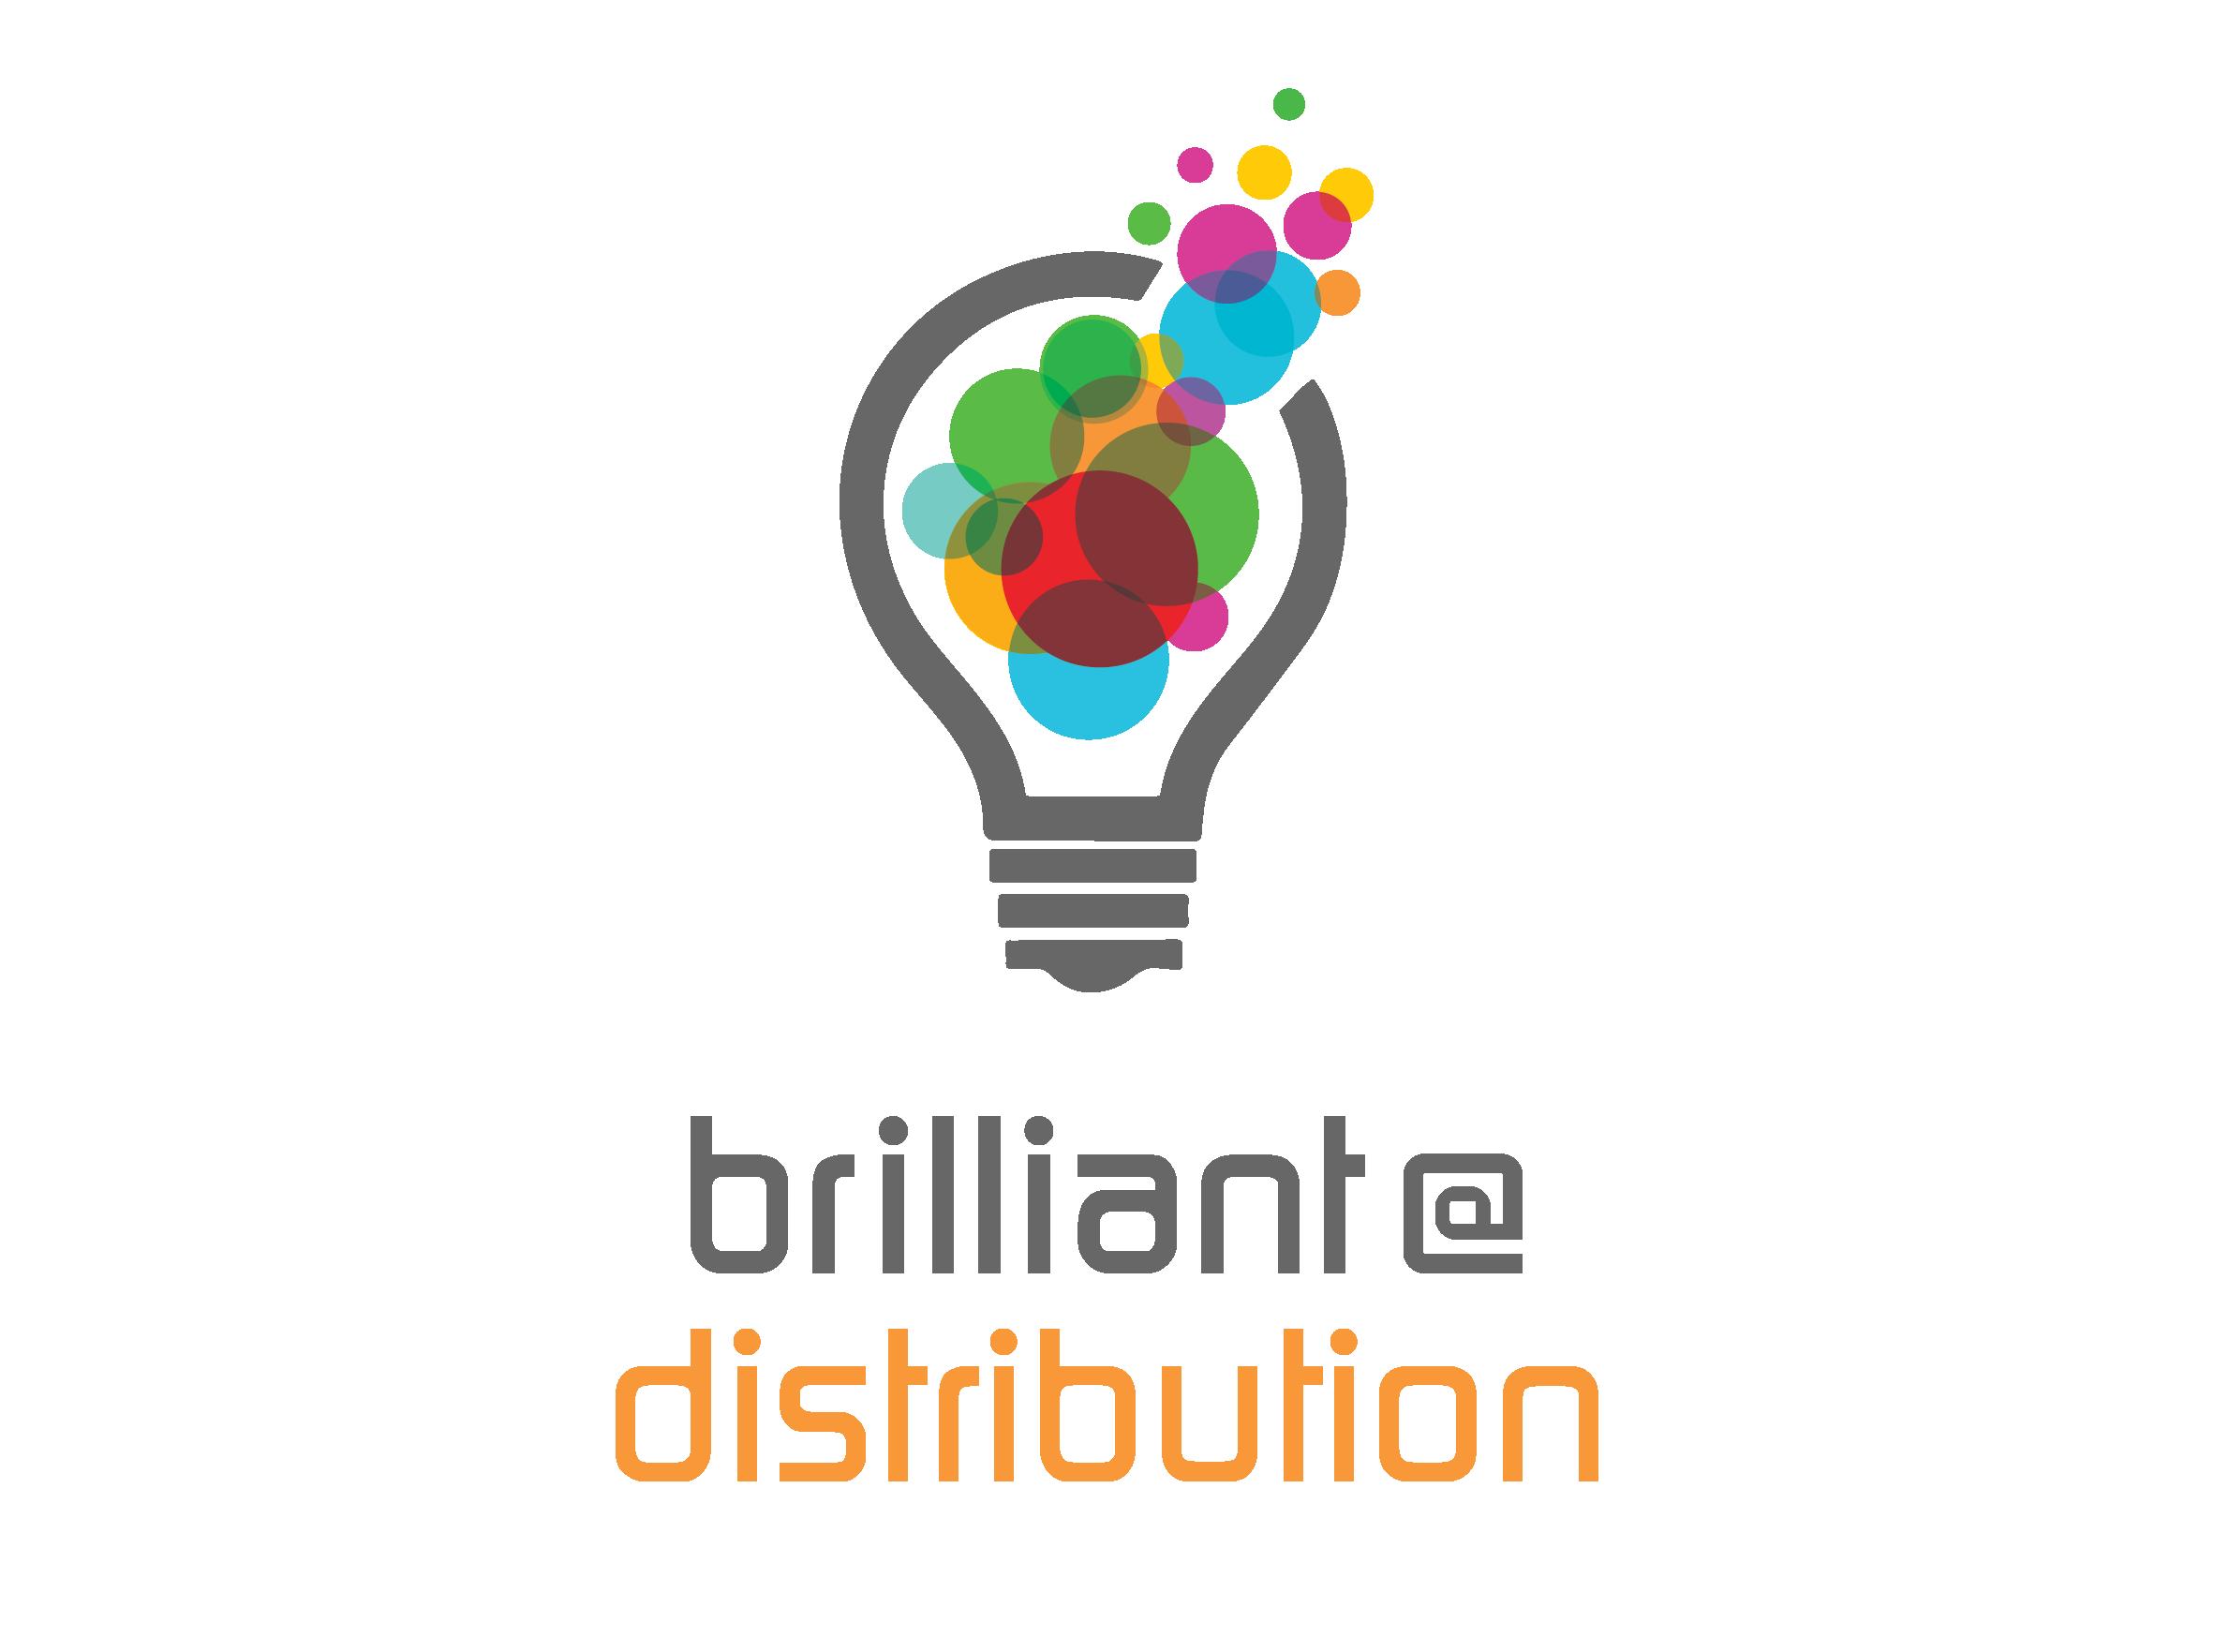 Brilliant @ company logos_Distribution copy